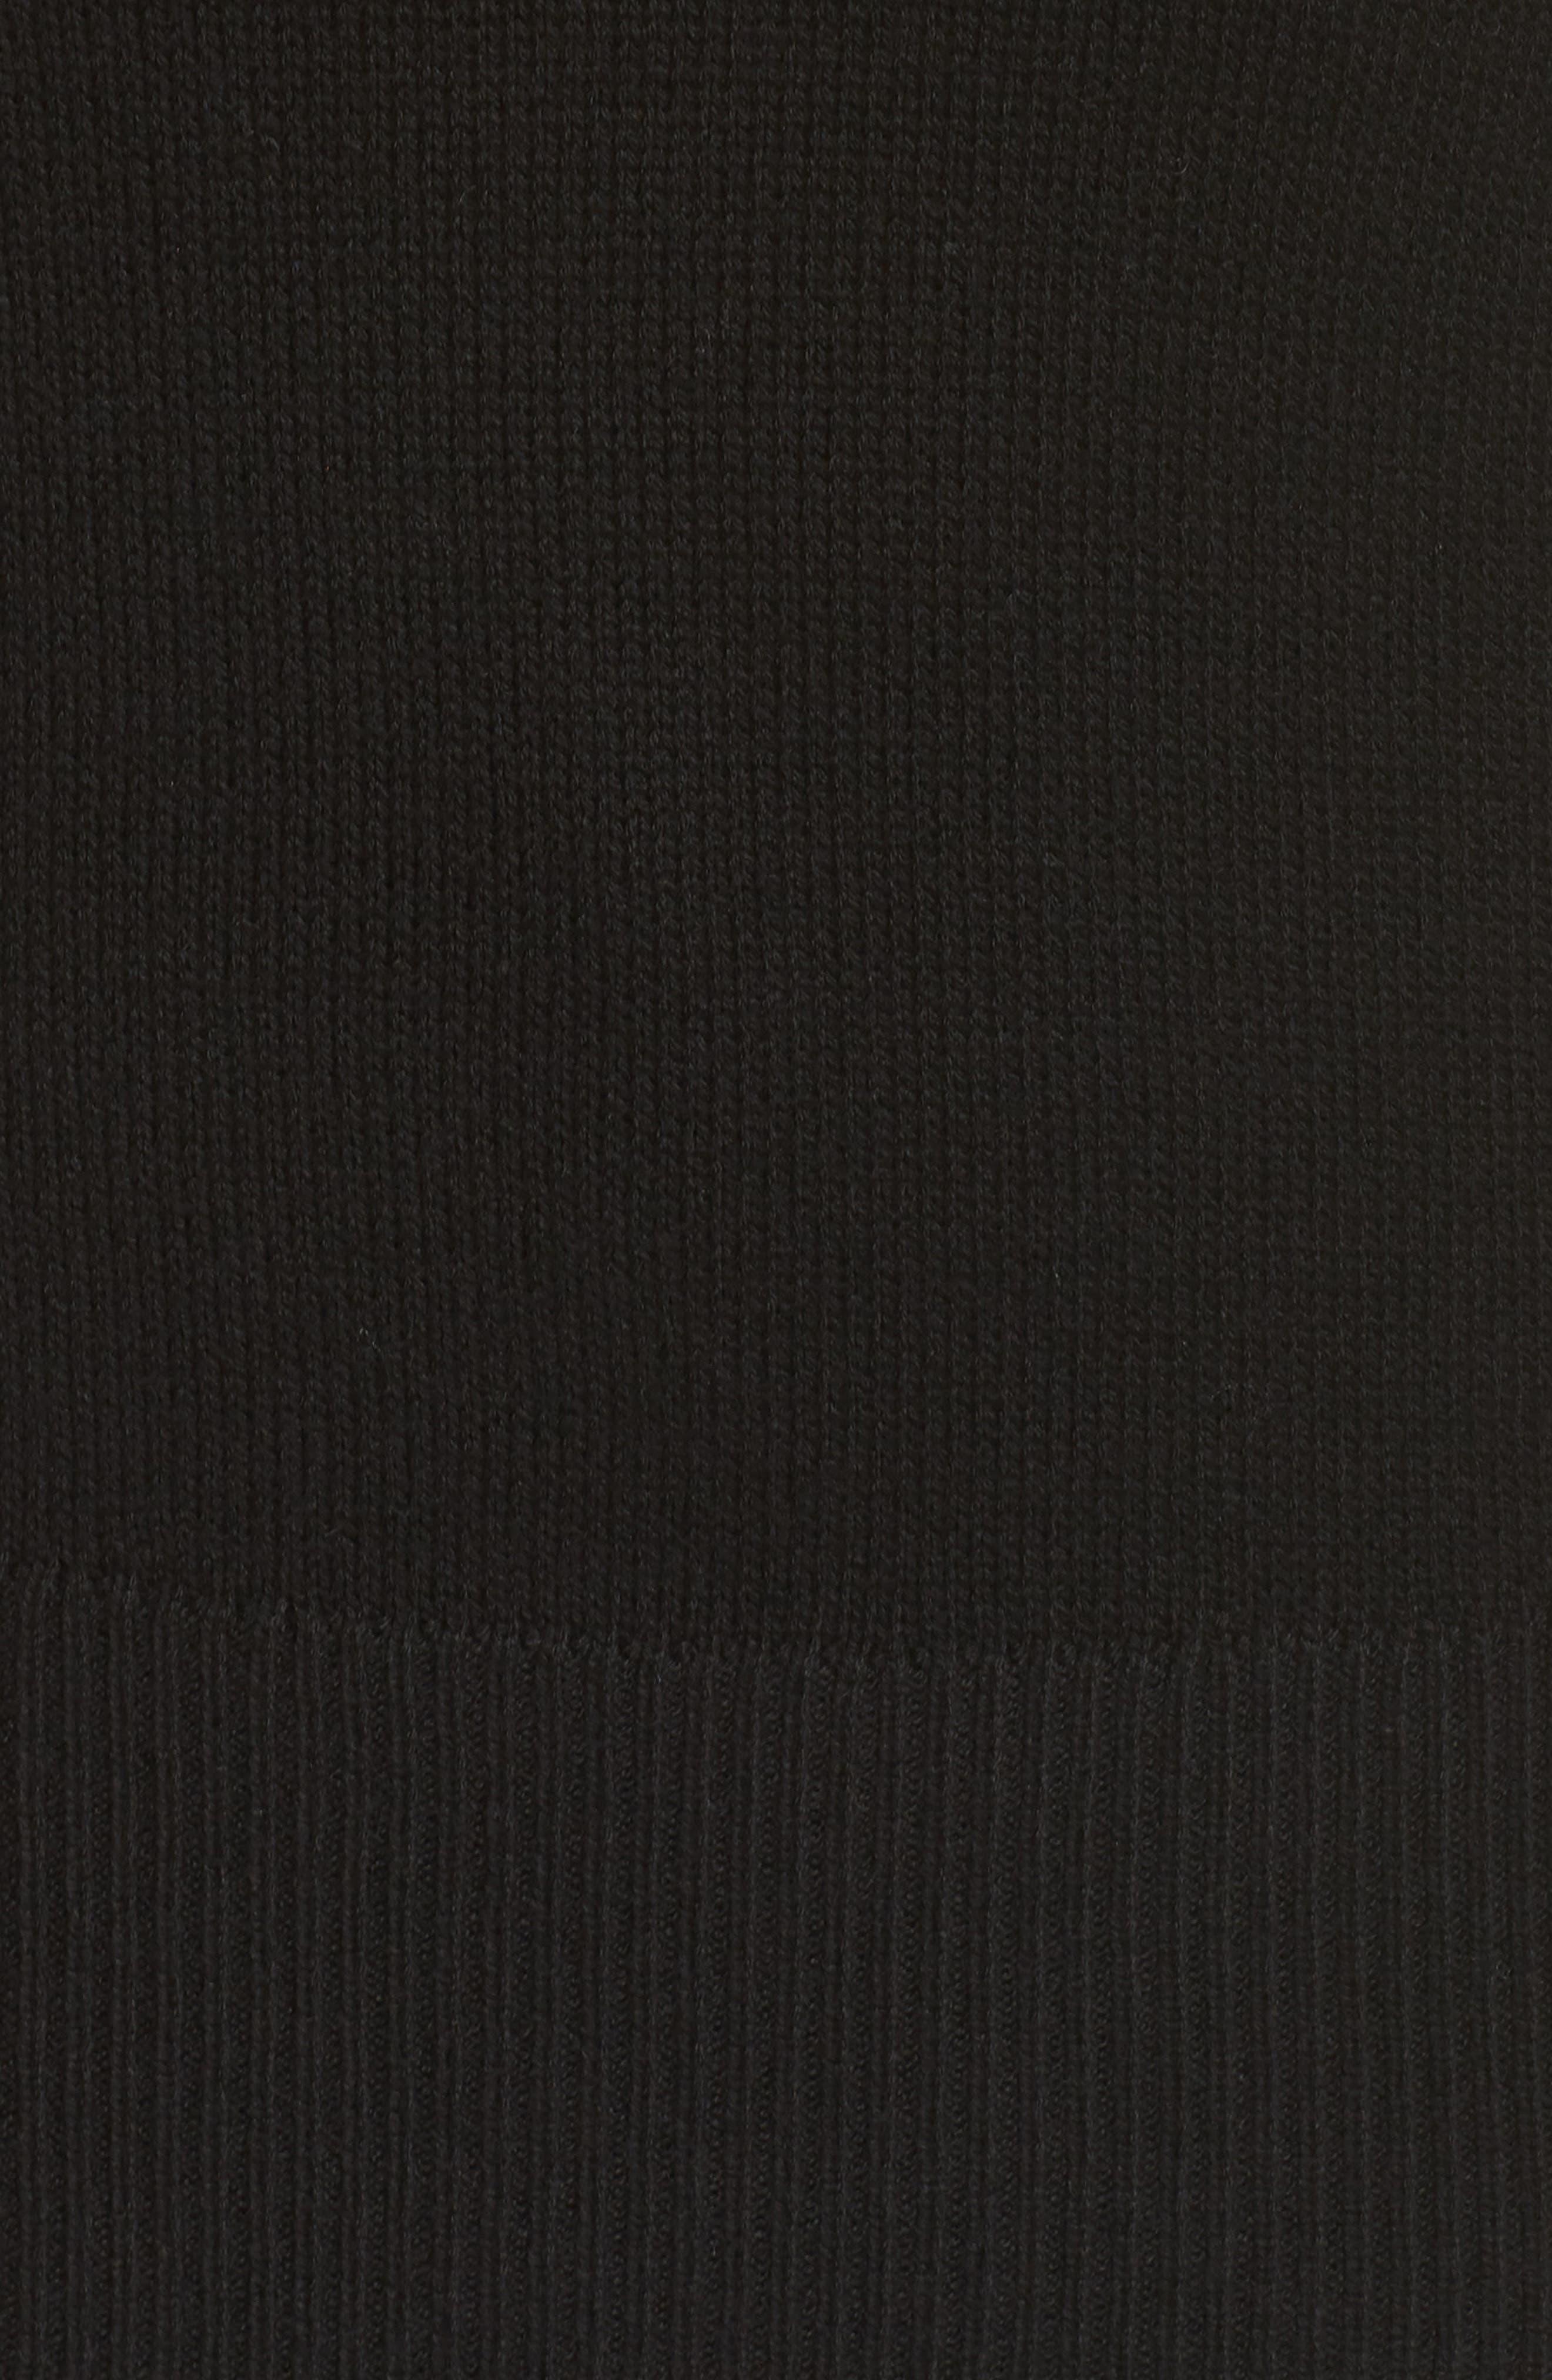 Split Neck Sweater,                             Alternate thumbnail 5, color,                             BLACK